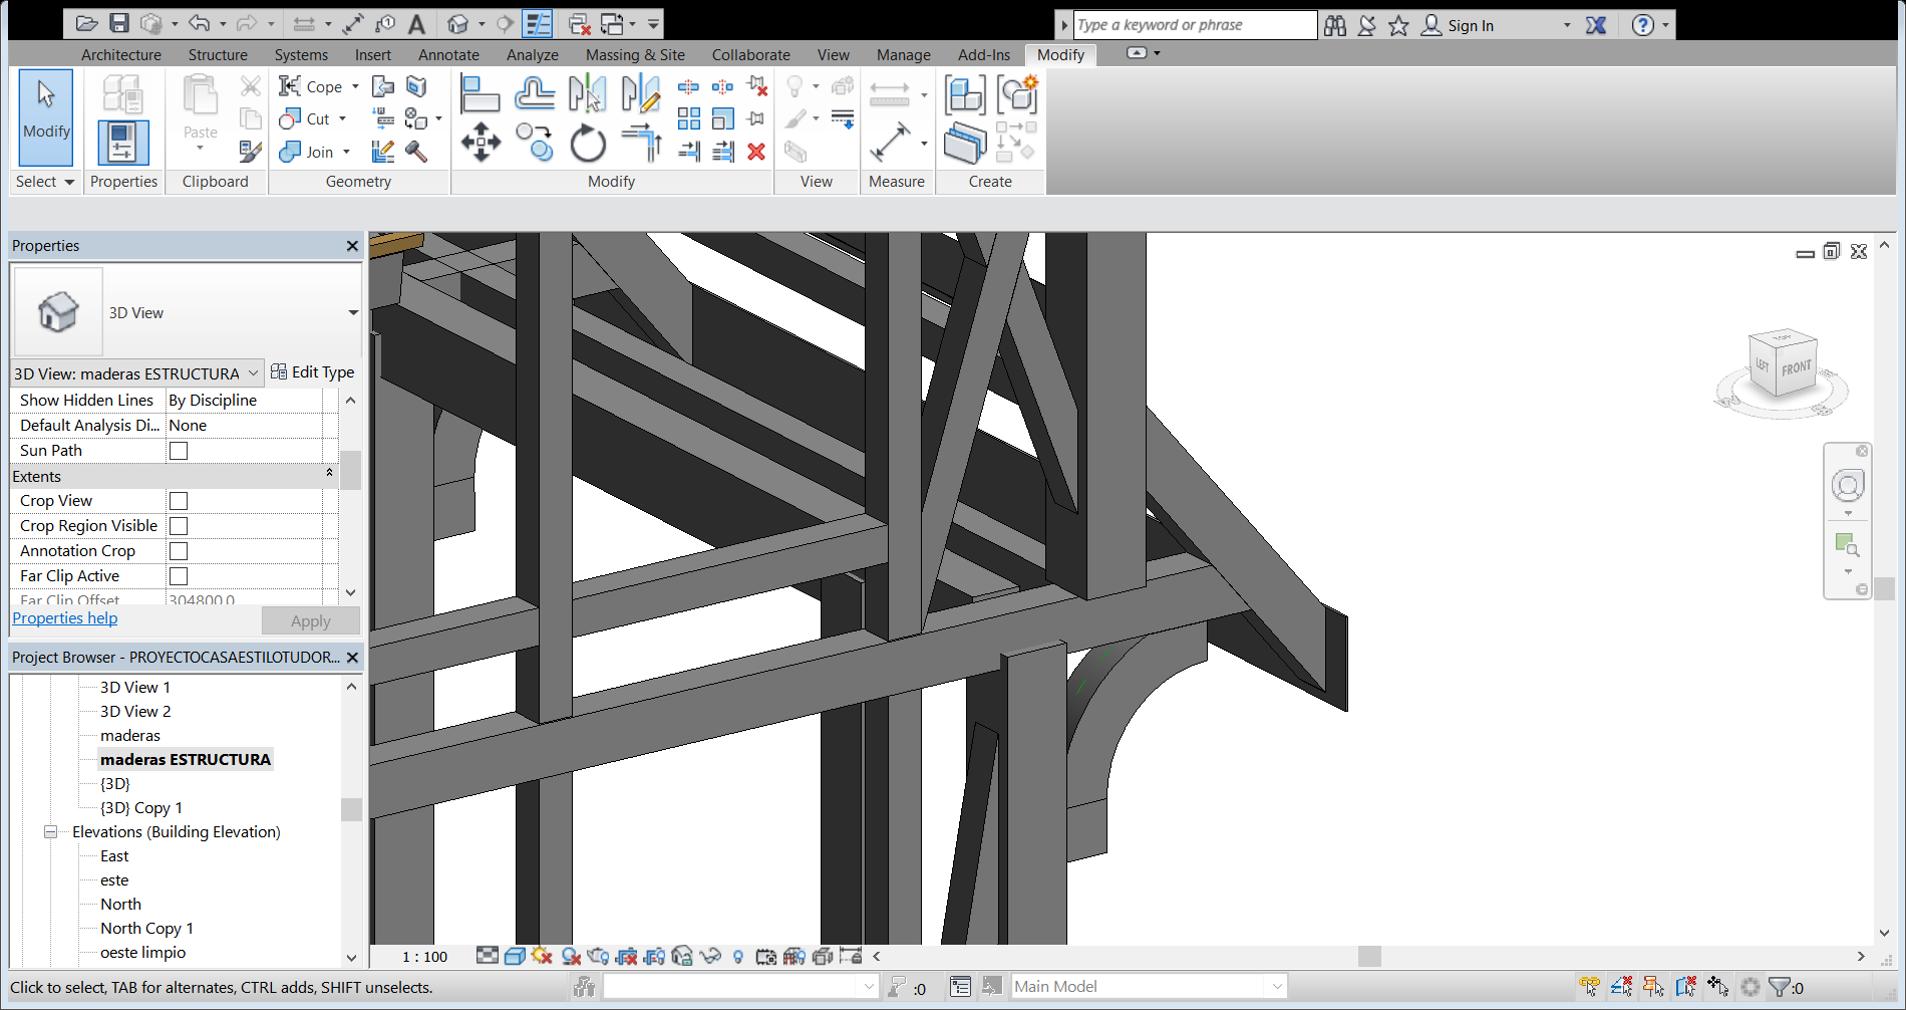 detalle constructivo 2 | Curso Revit Structure